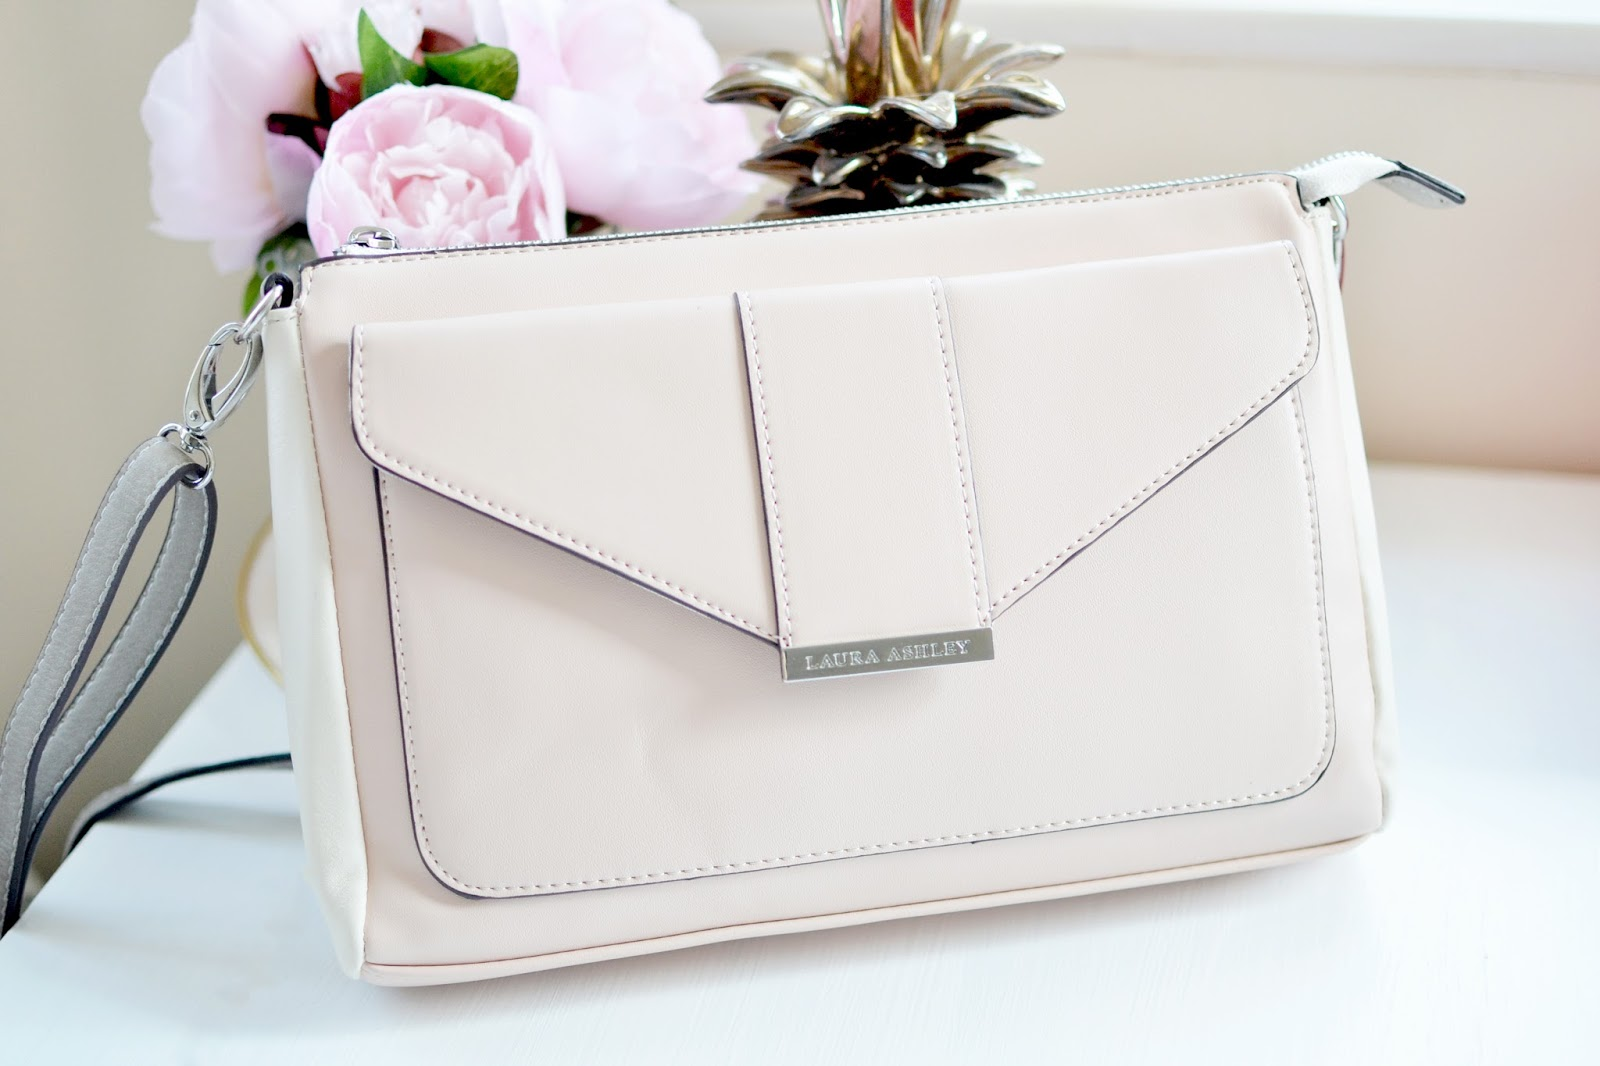 fashion blogger uk, pink bag, laura ashley bag